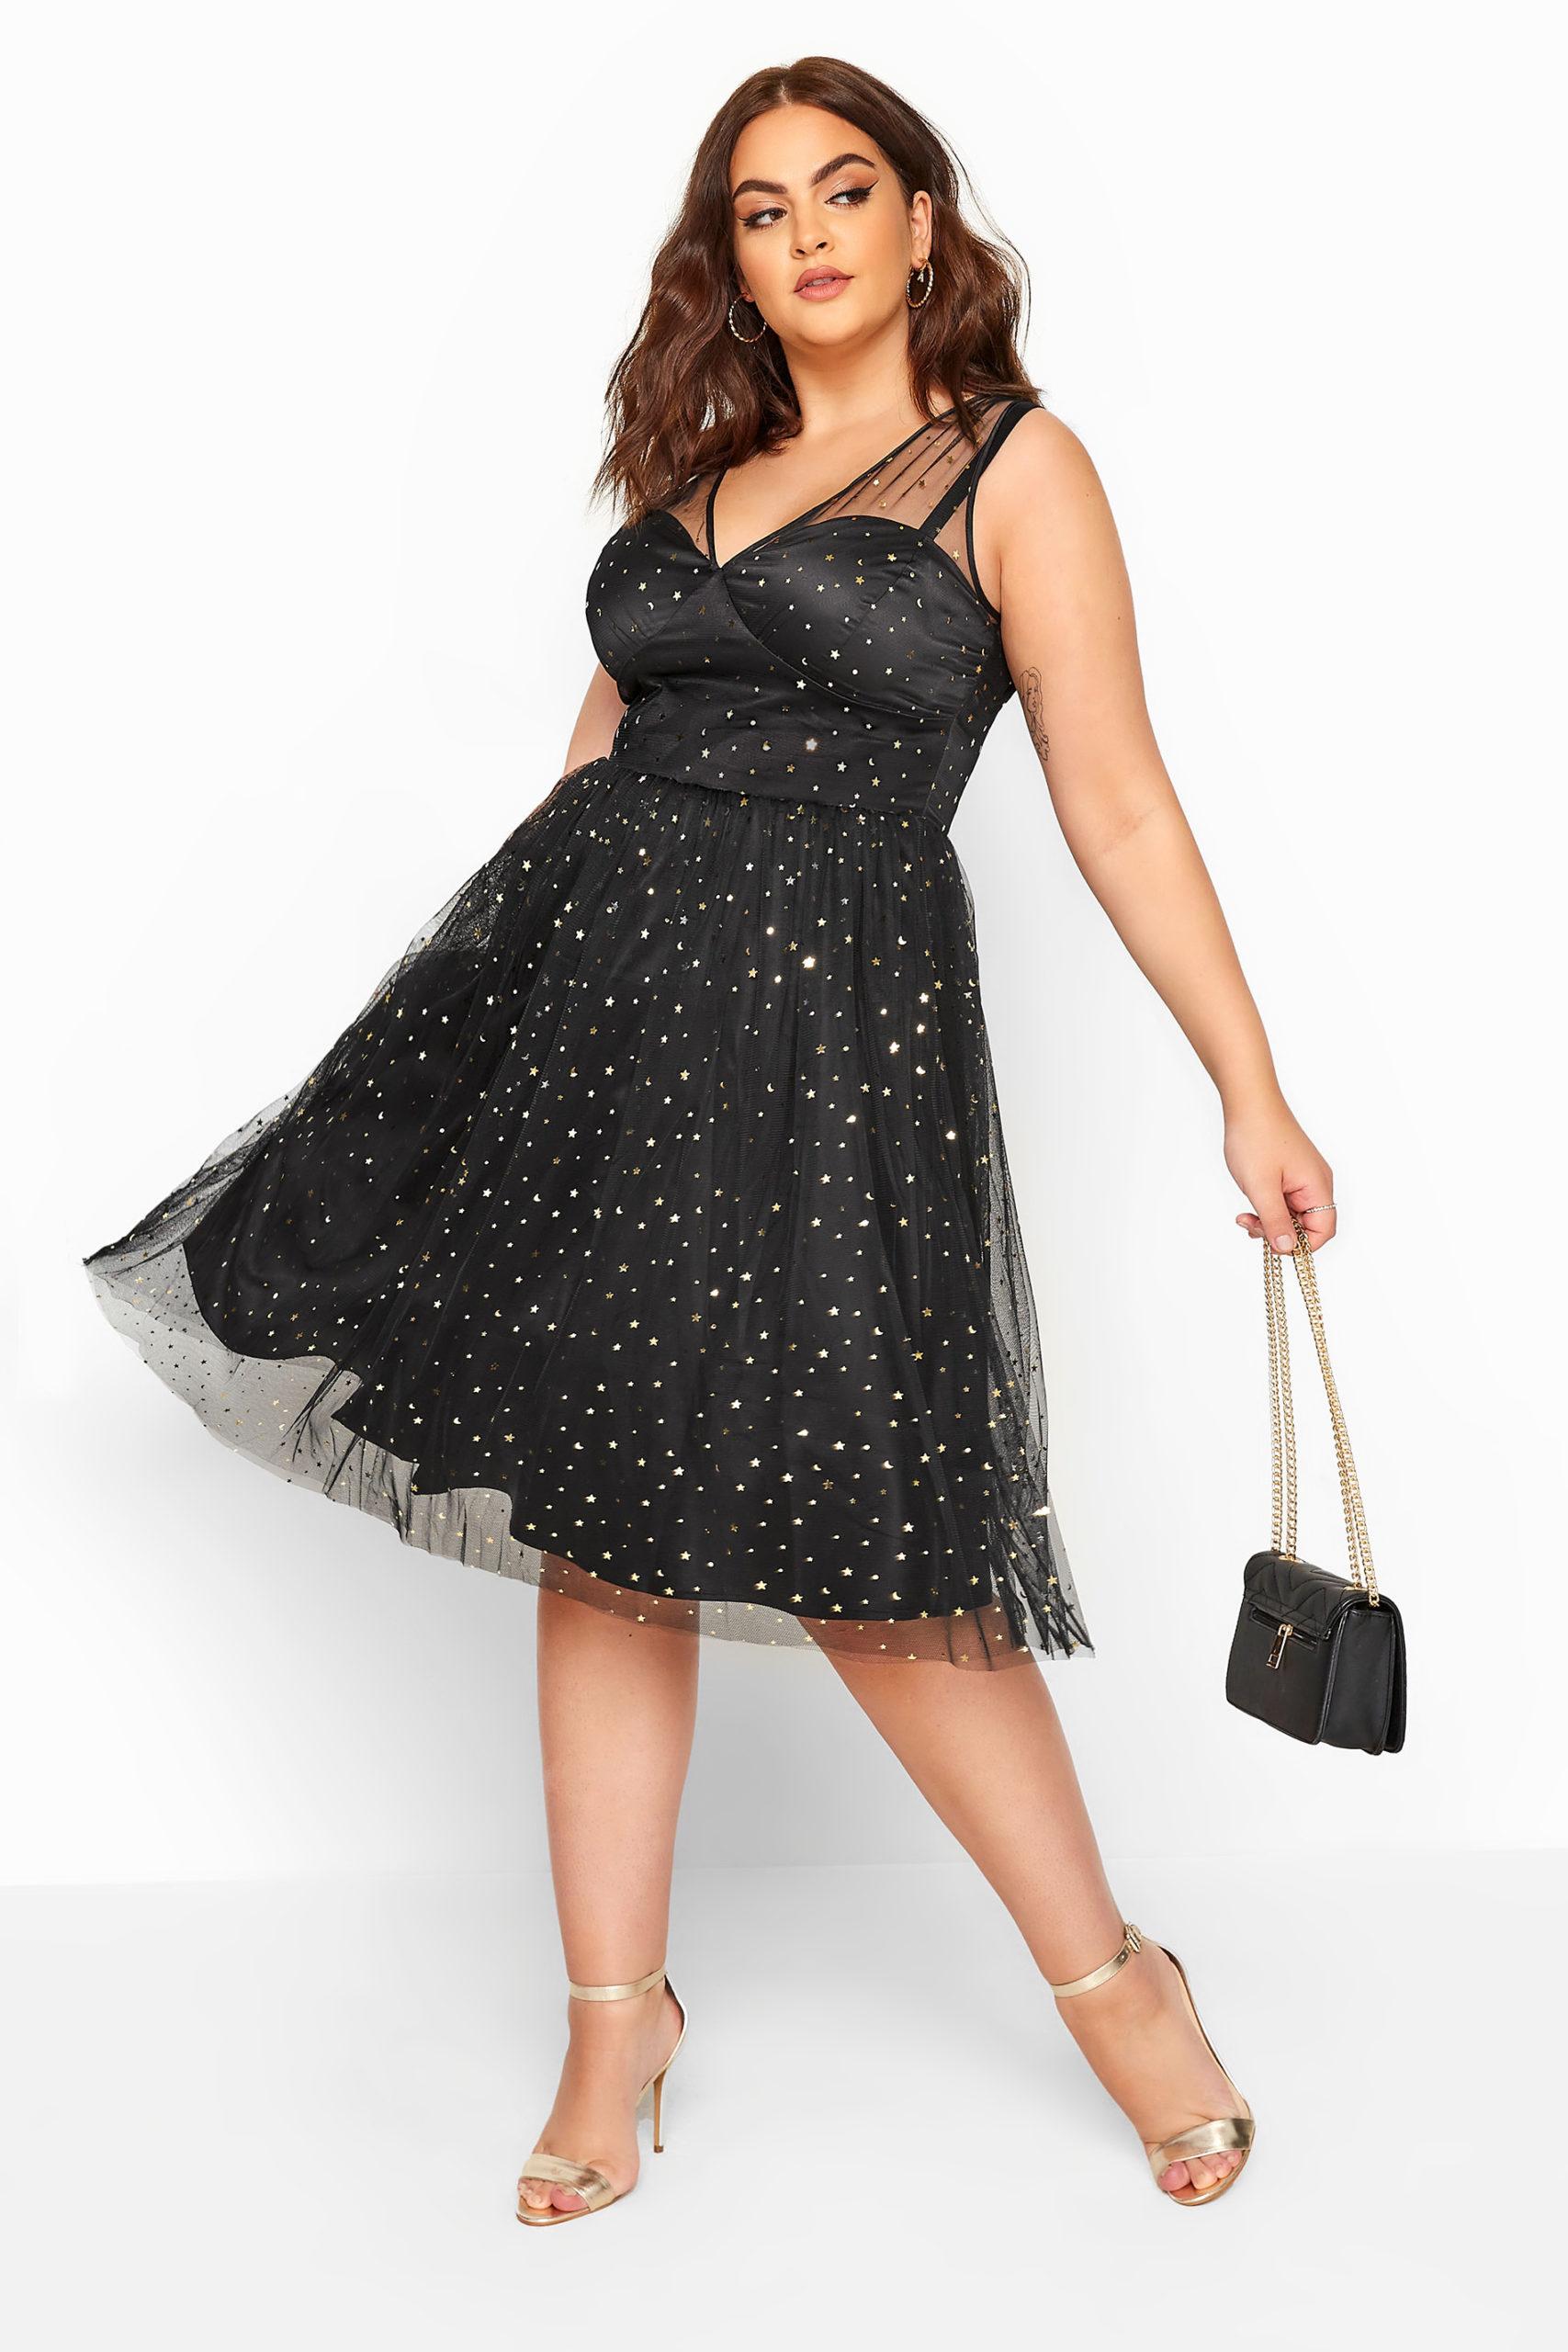 Star Printed Dress